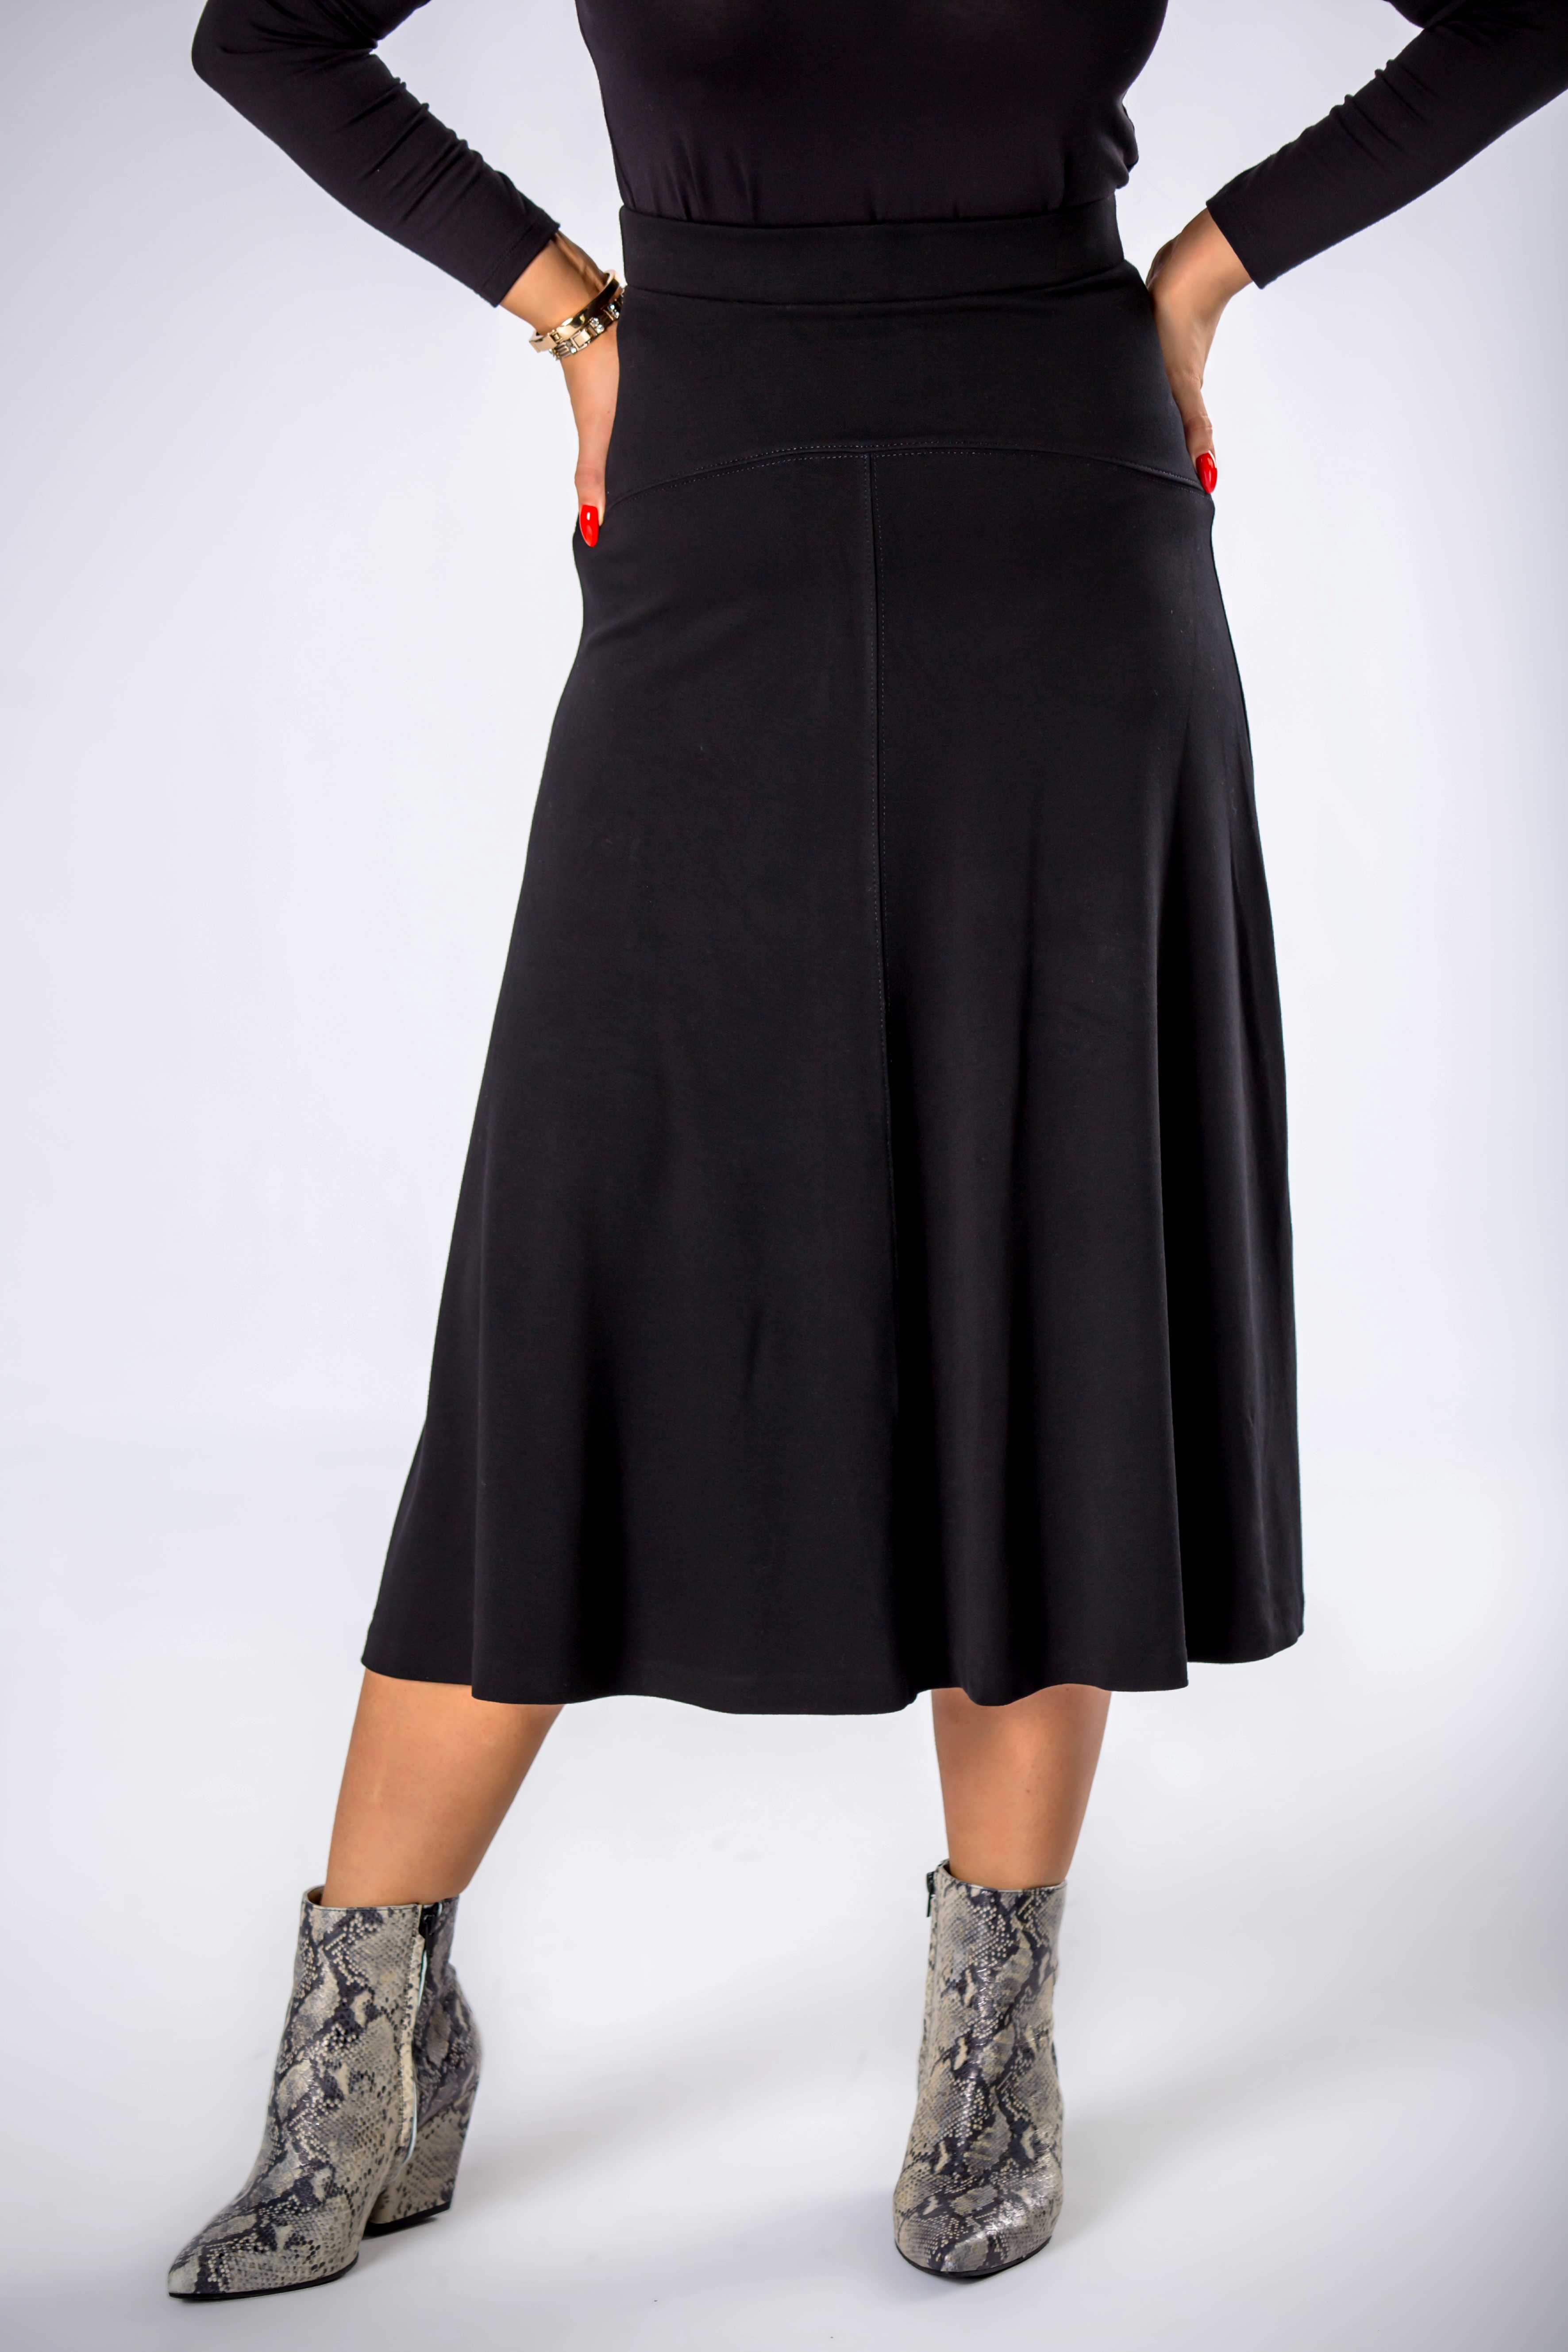 Elegantná dámska čierna sukňa - 38